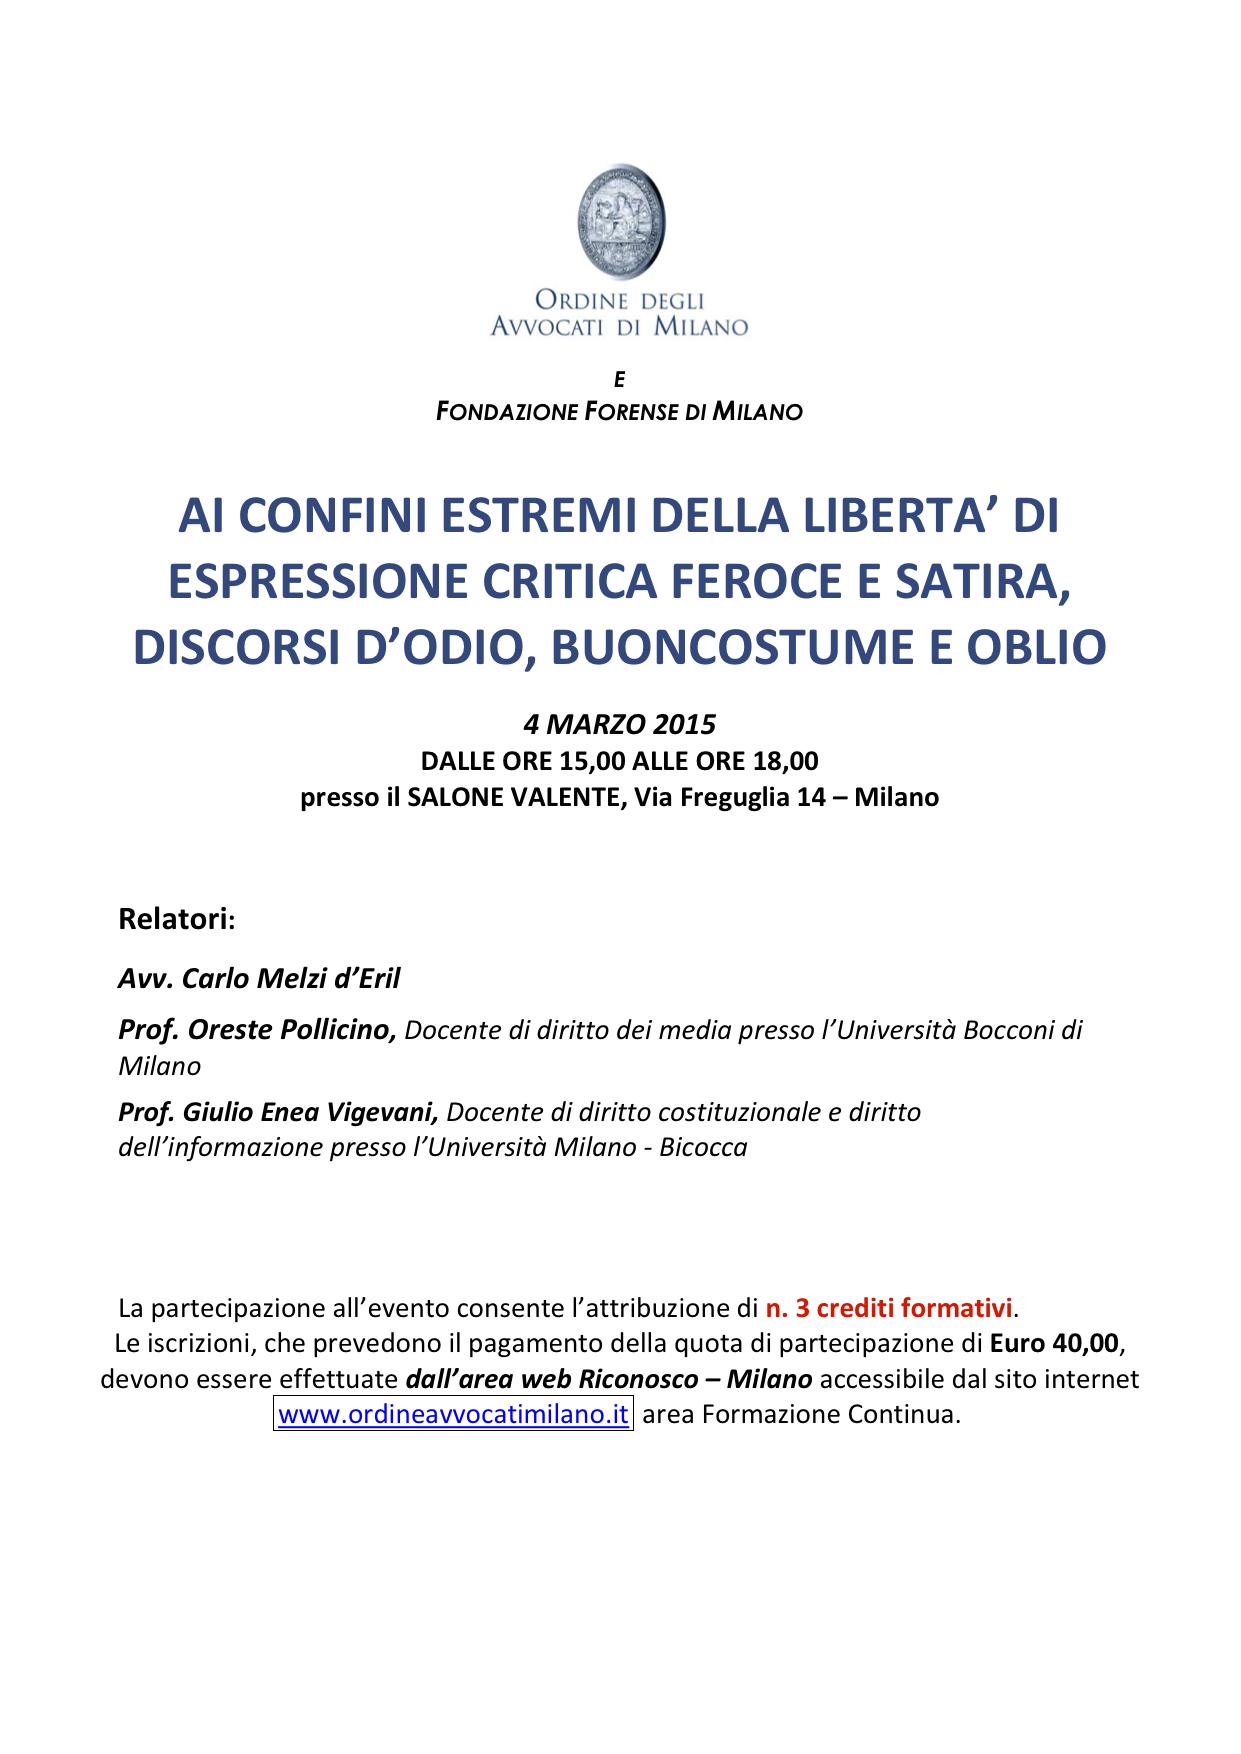 Locandina-convegno-4-marzo-2015